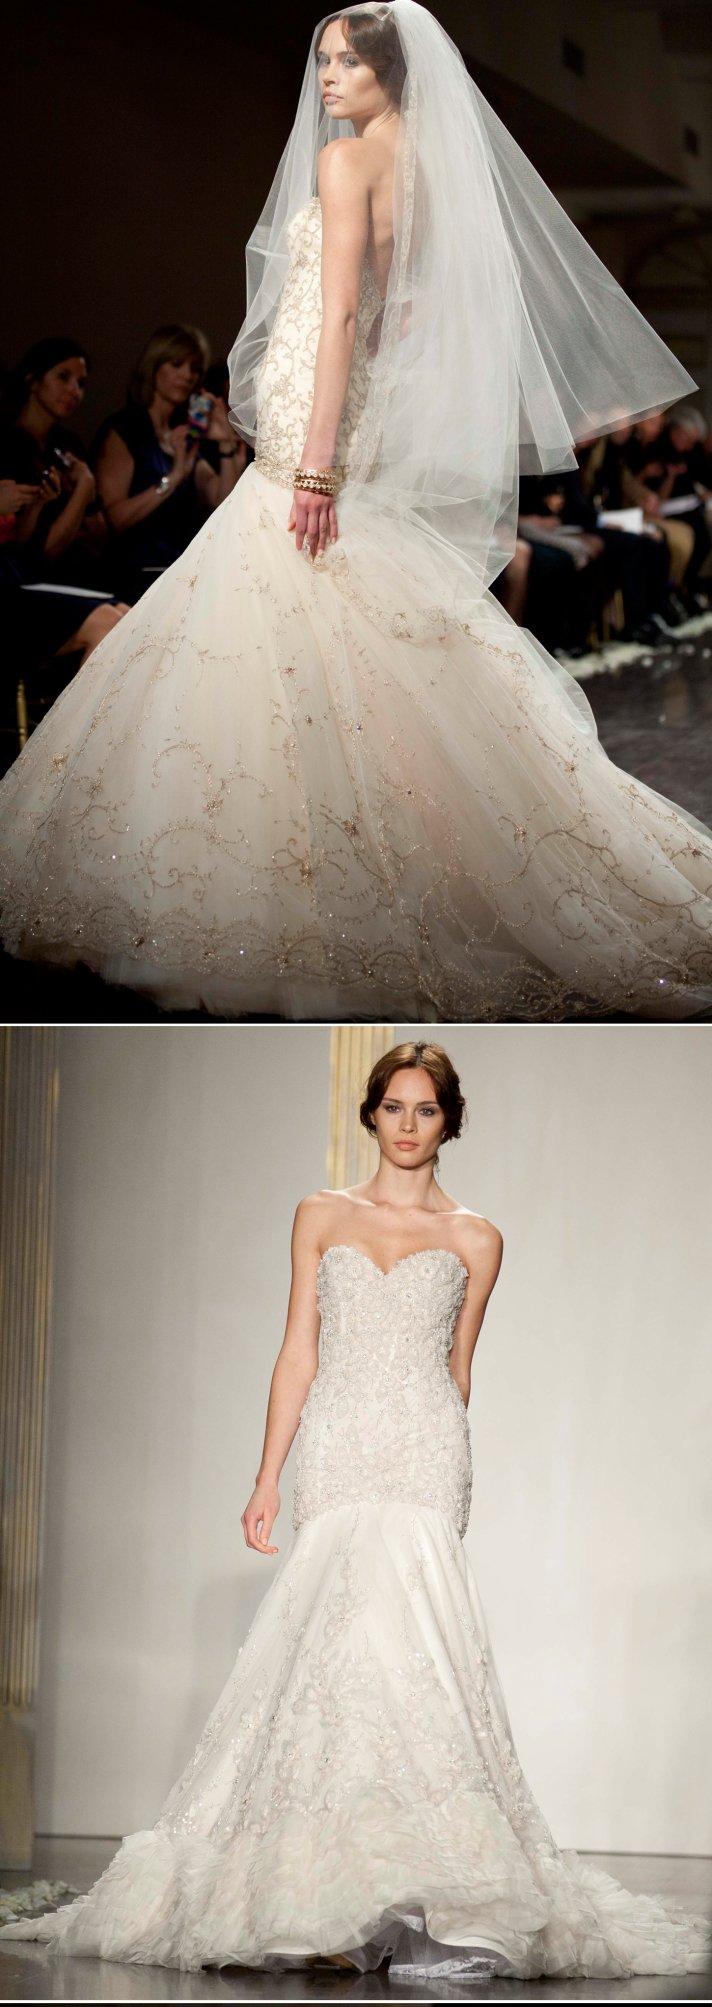 2012 mermaid wedding dresses by Lazaro and Jim Hjelm